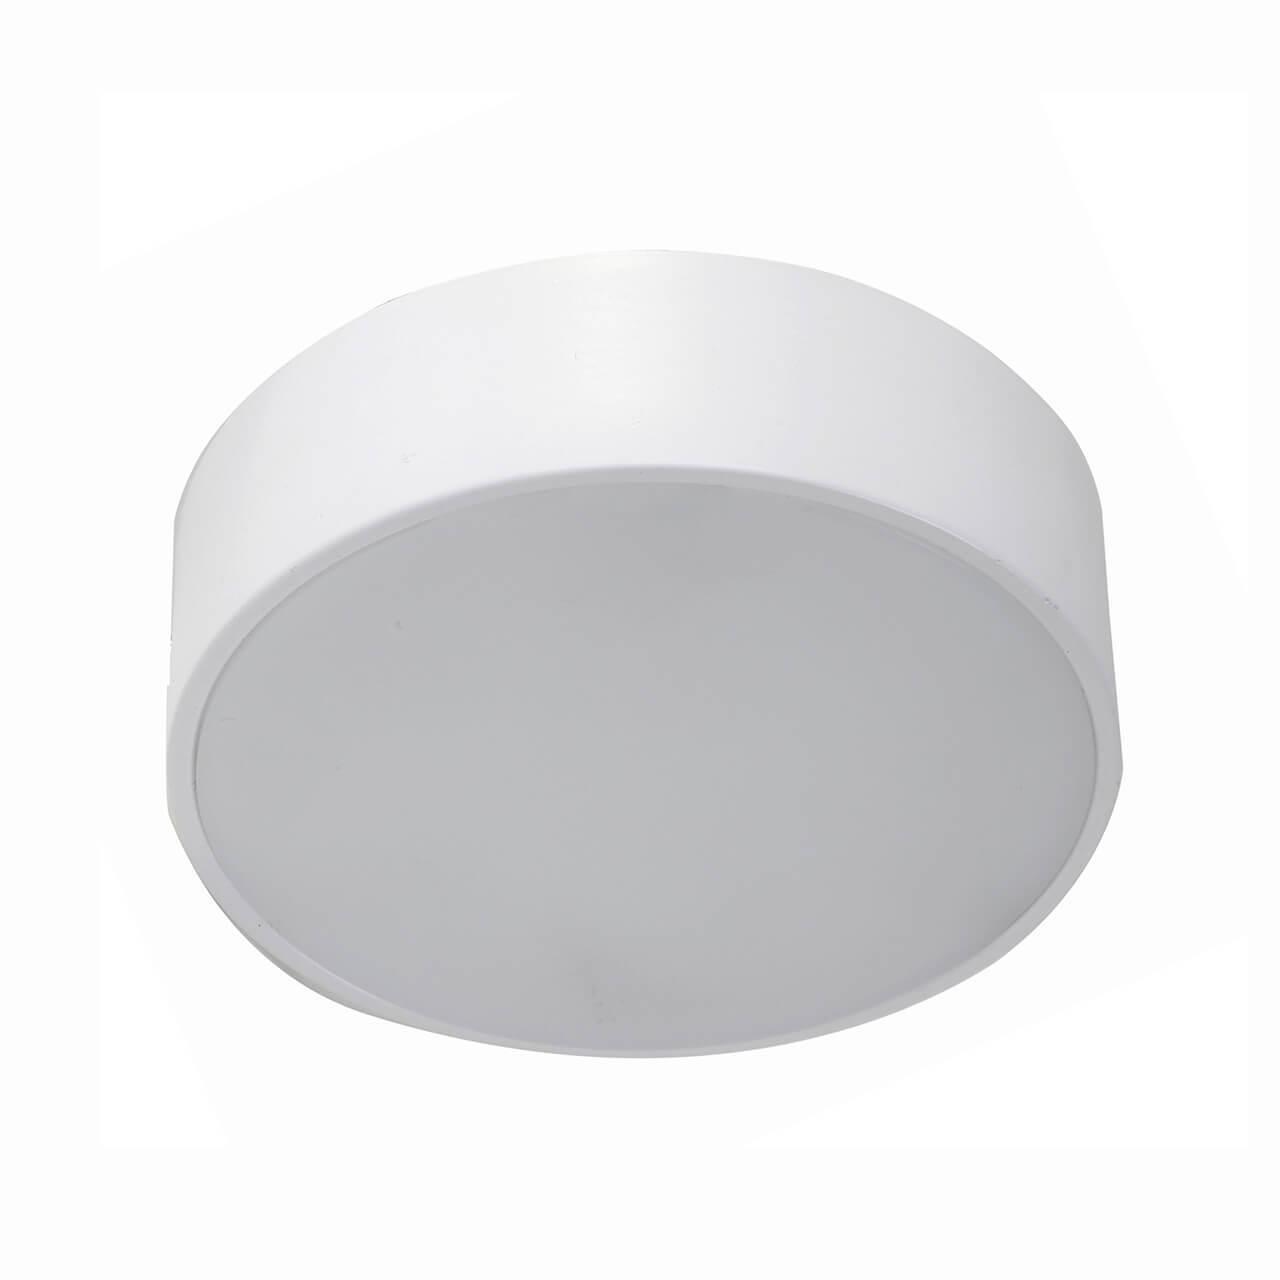 Накладной светильник Favourite 2065-16C, LED, 16 Вт цена